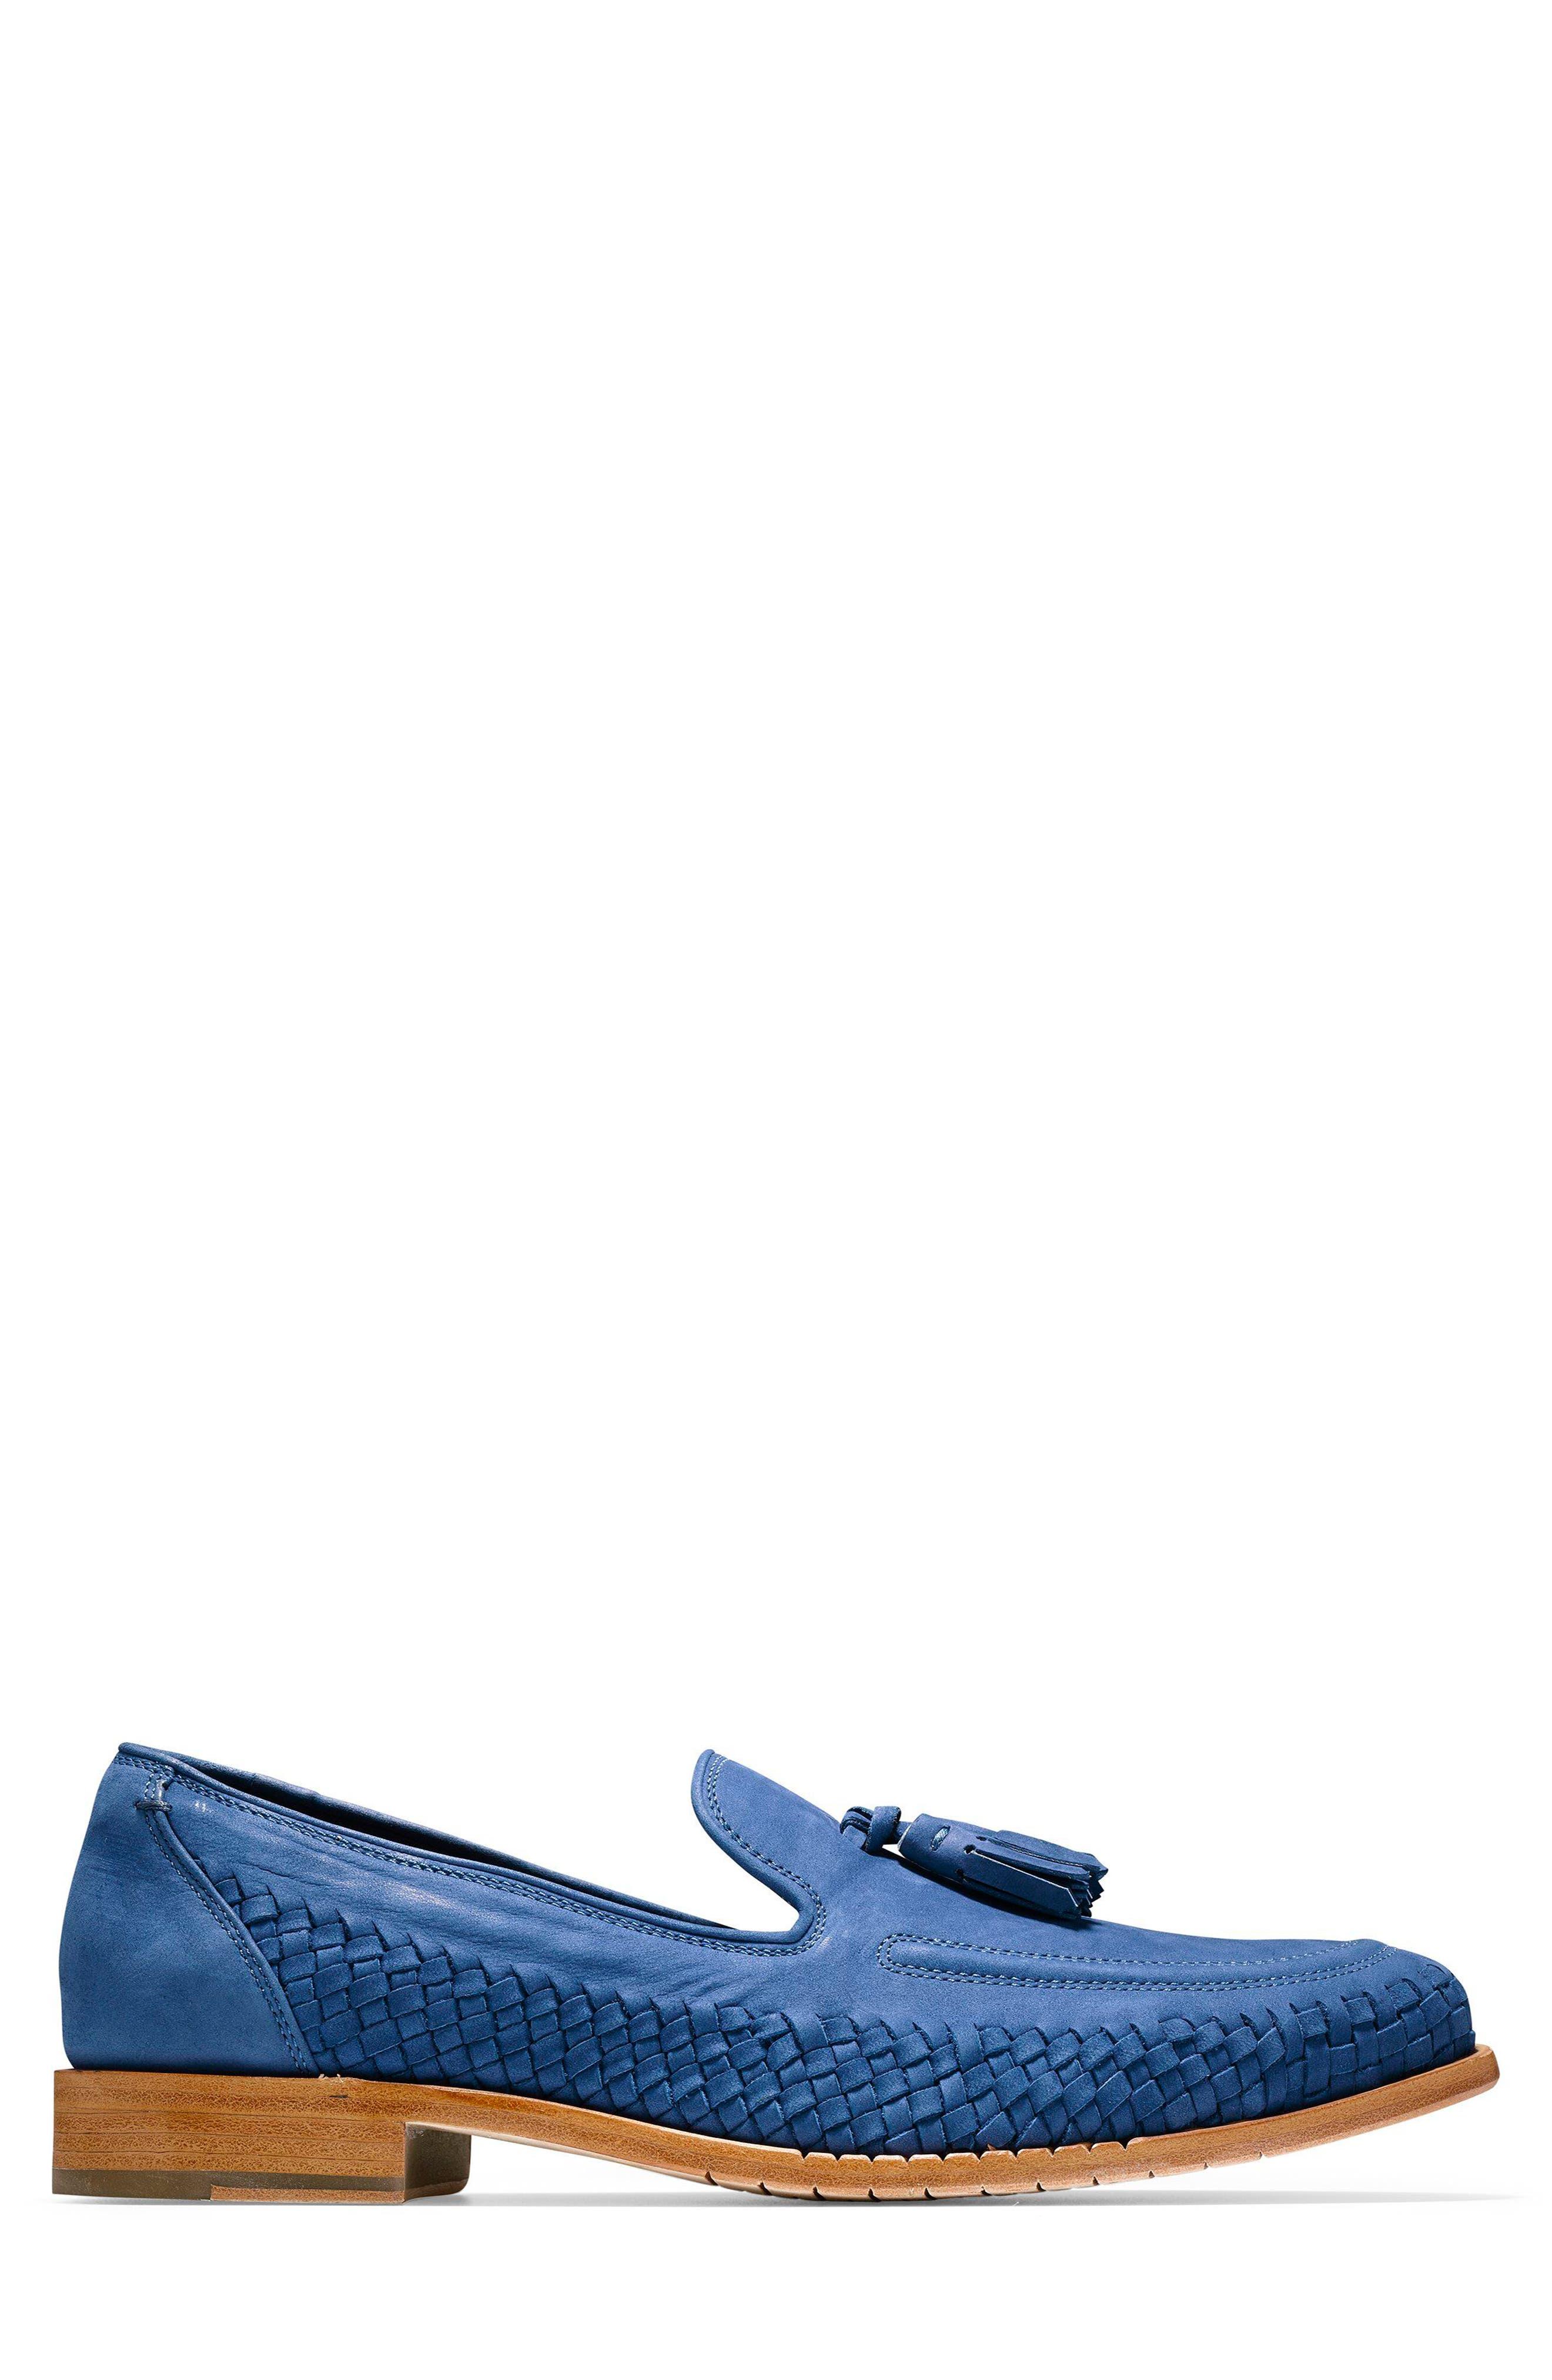 Washington Grand Tassel Loafer,                             Alternate thumbnail 12, color,